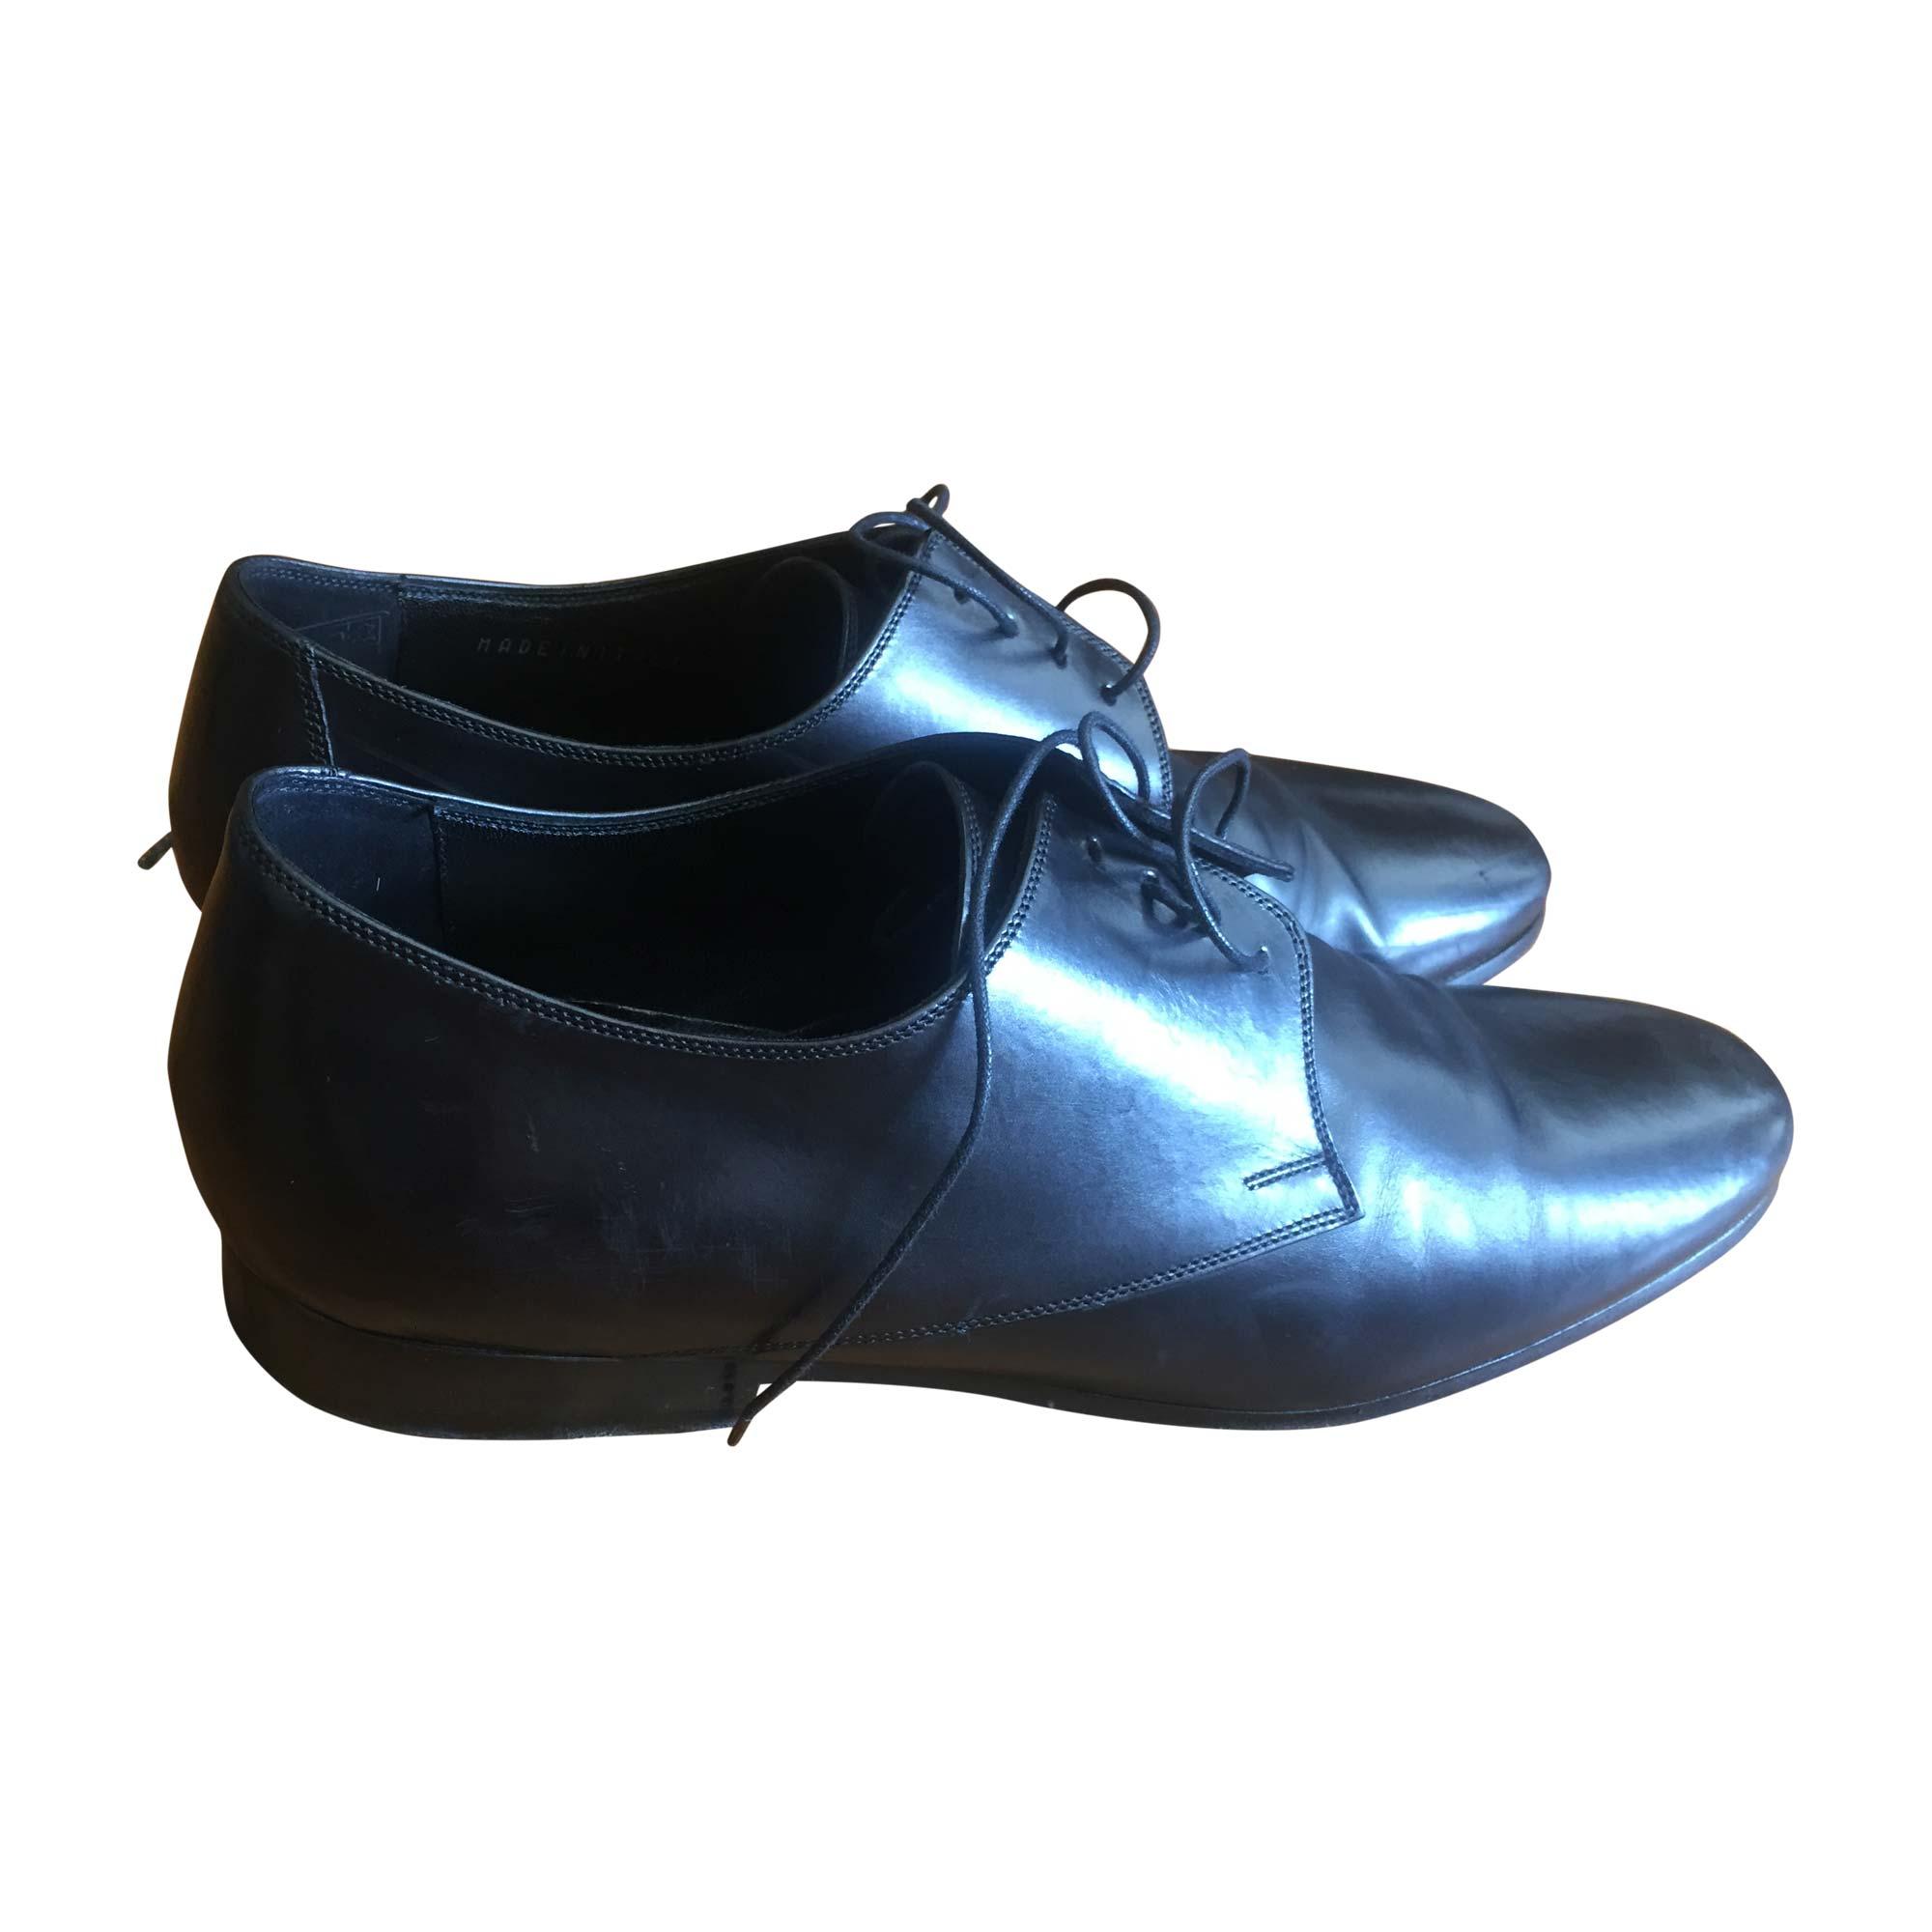 Lacets À À Lacets Chaussures Chaussures Chaussures À À Lacets Lacets Chaussures AcR5q3L4j